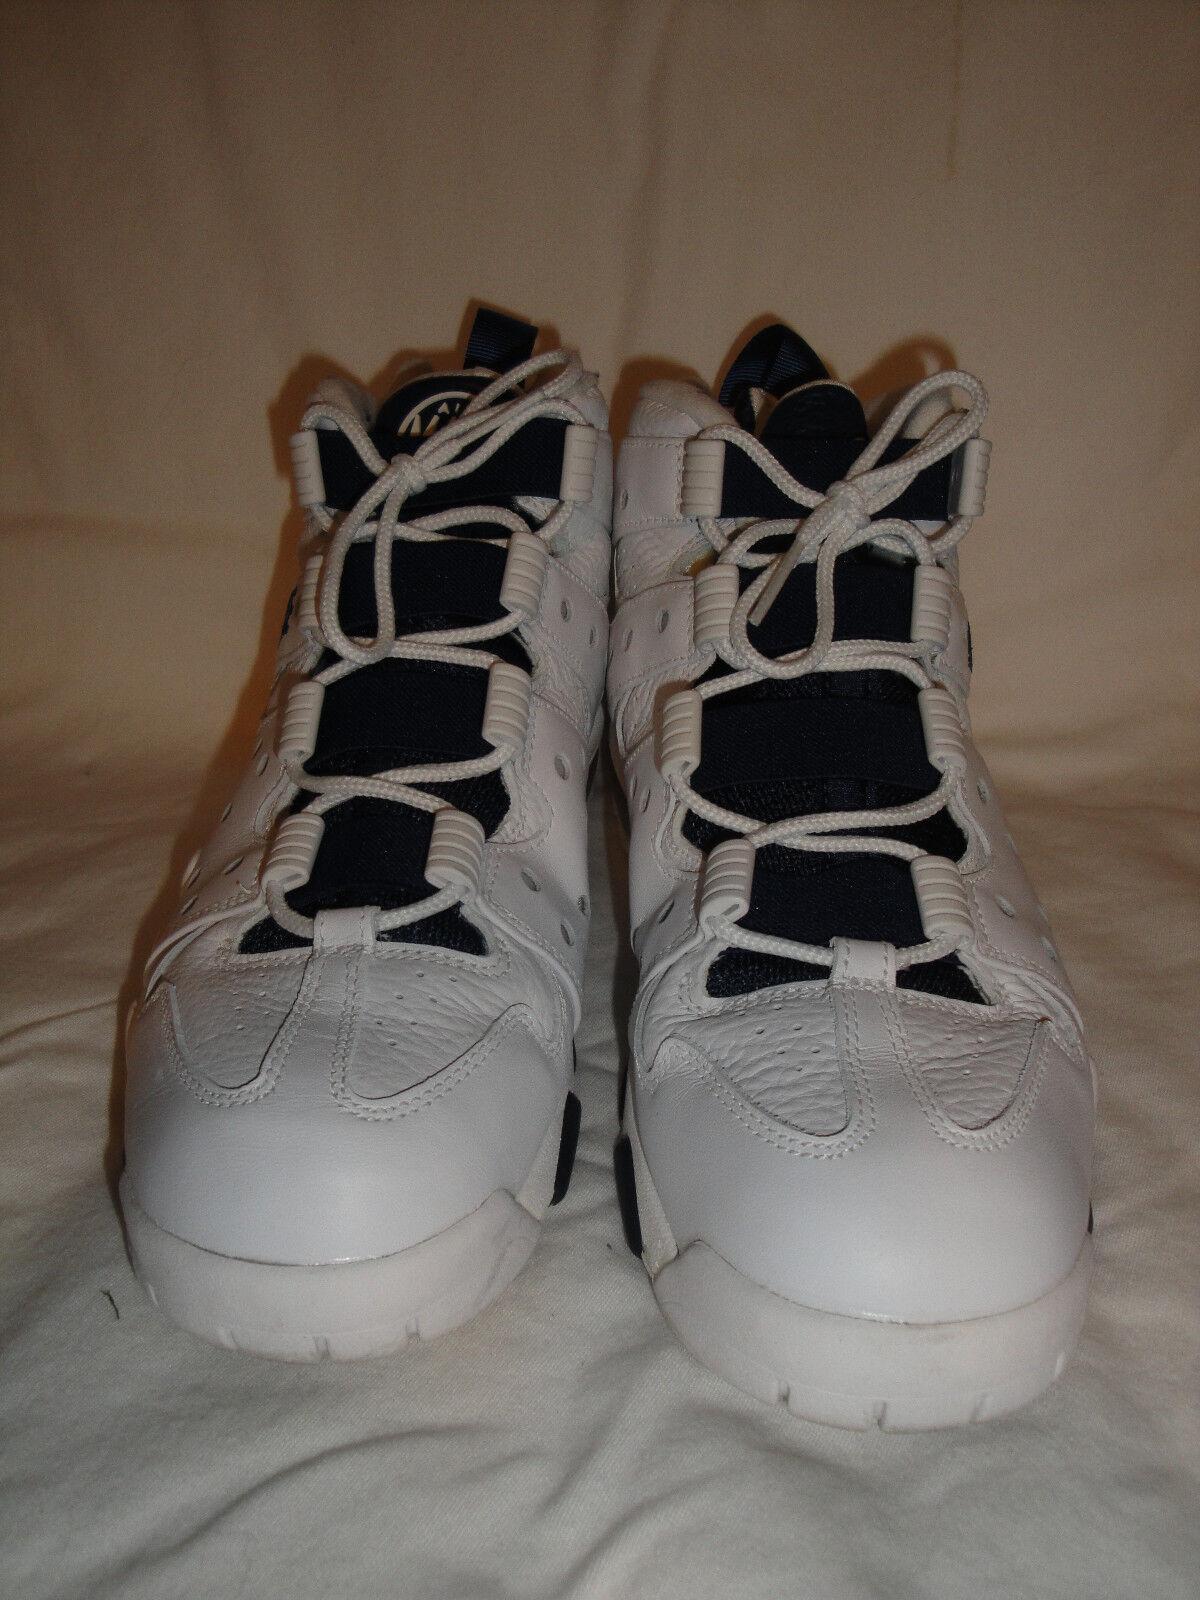 Nike air max2 bc marina '94 bianco / mezzanotte marina bc taglia 10 stile c881ce